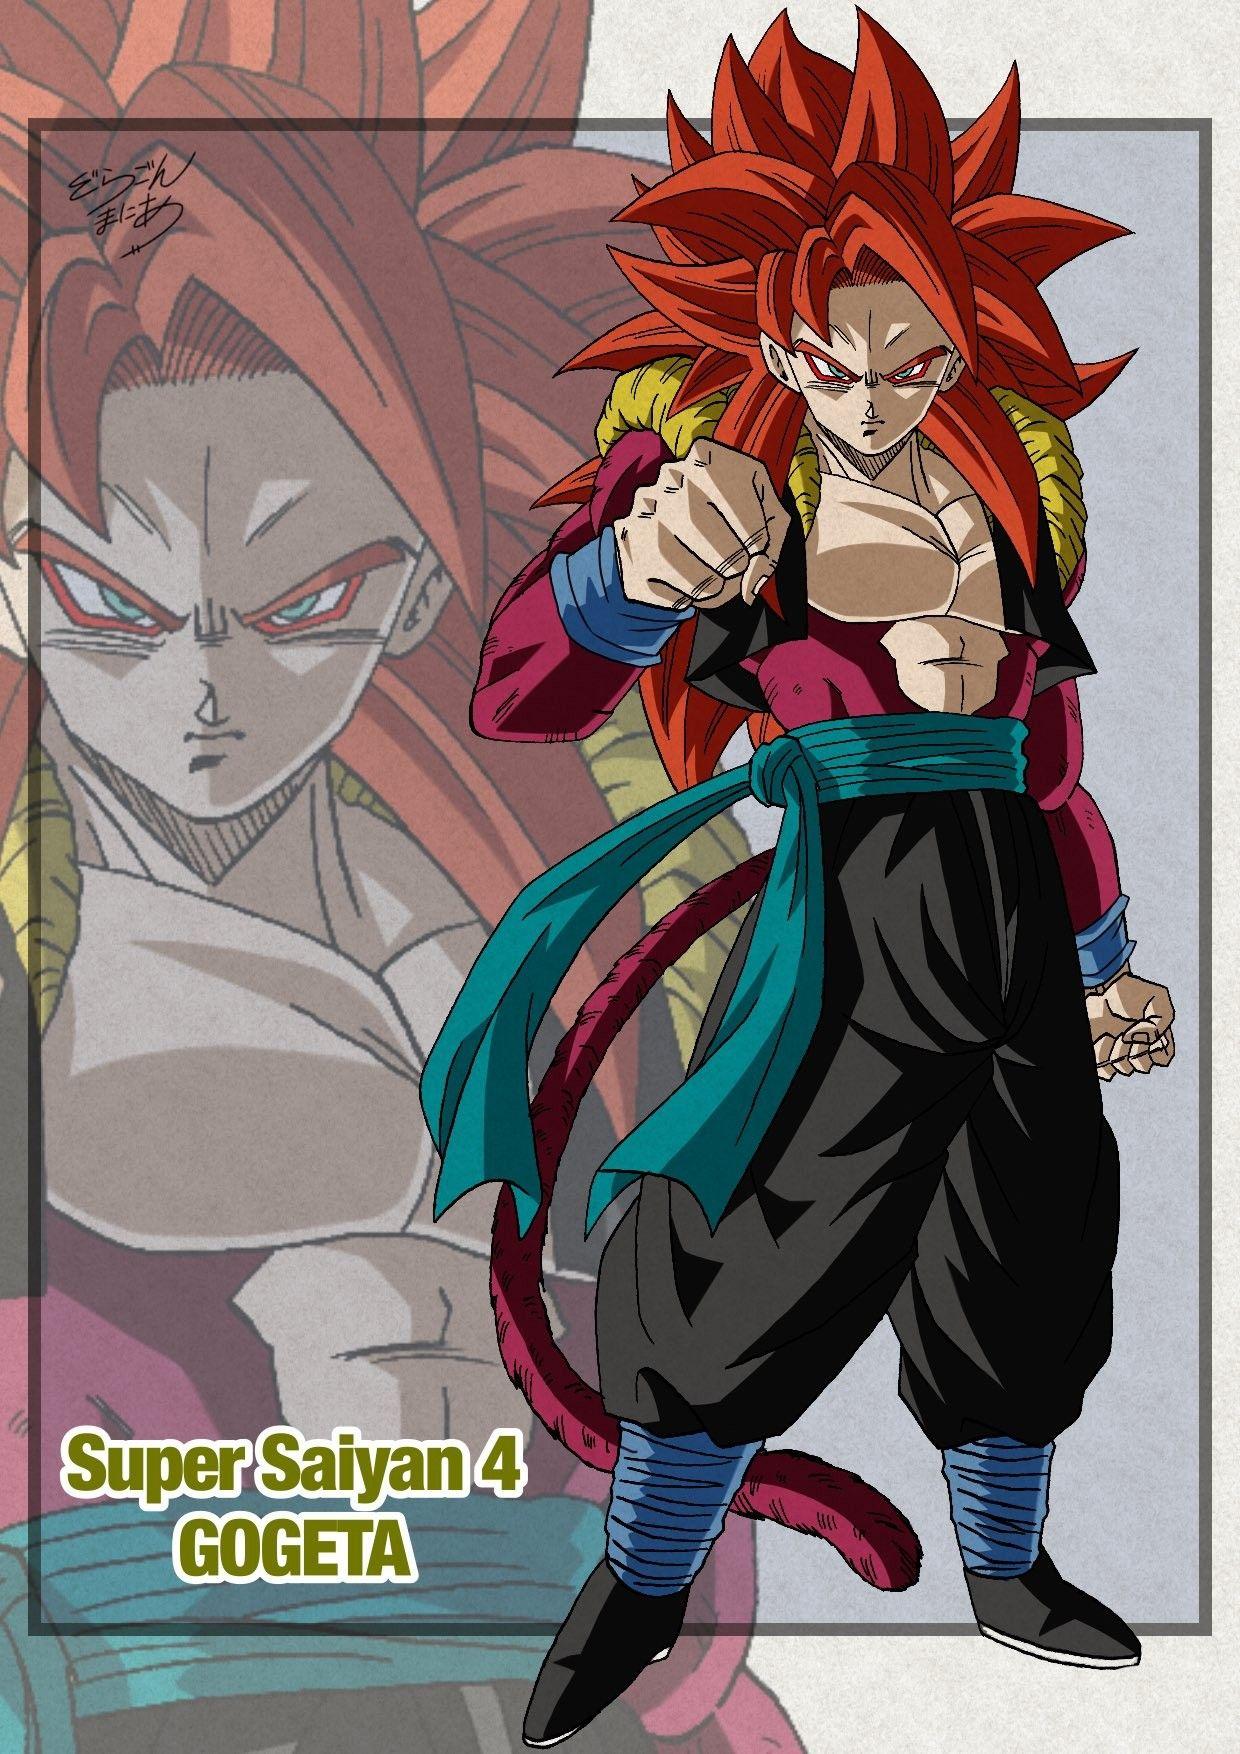 Gogeta Super Saiyajin Fase 4 Personajes De Dragon Ball Dibujos Vegetto Y Gogeta